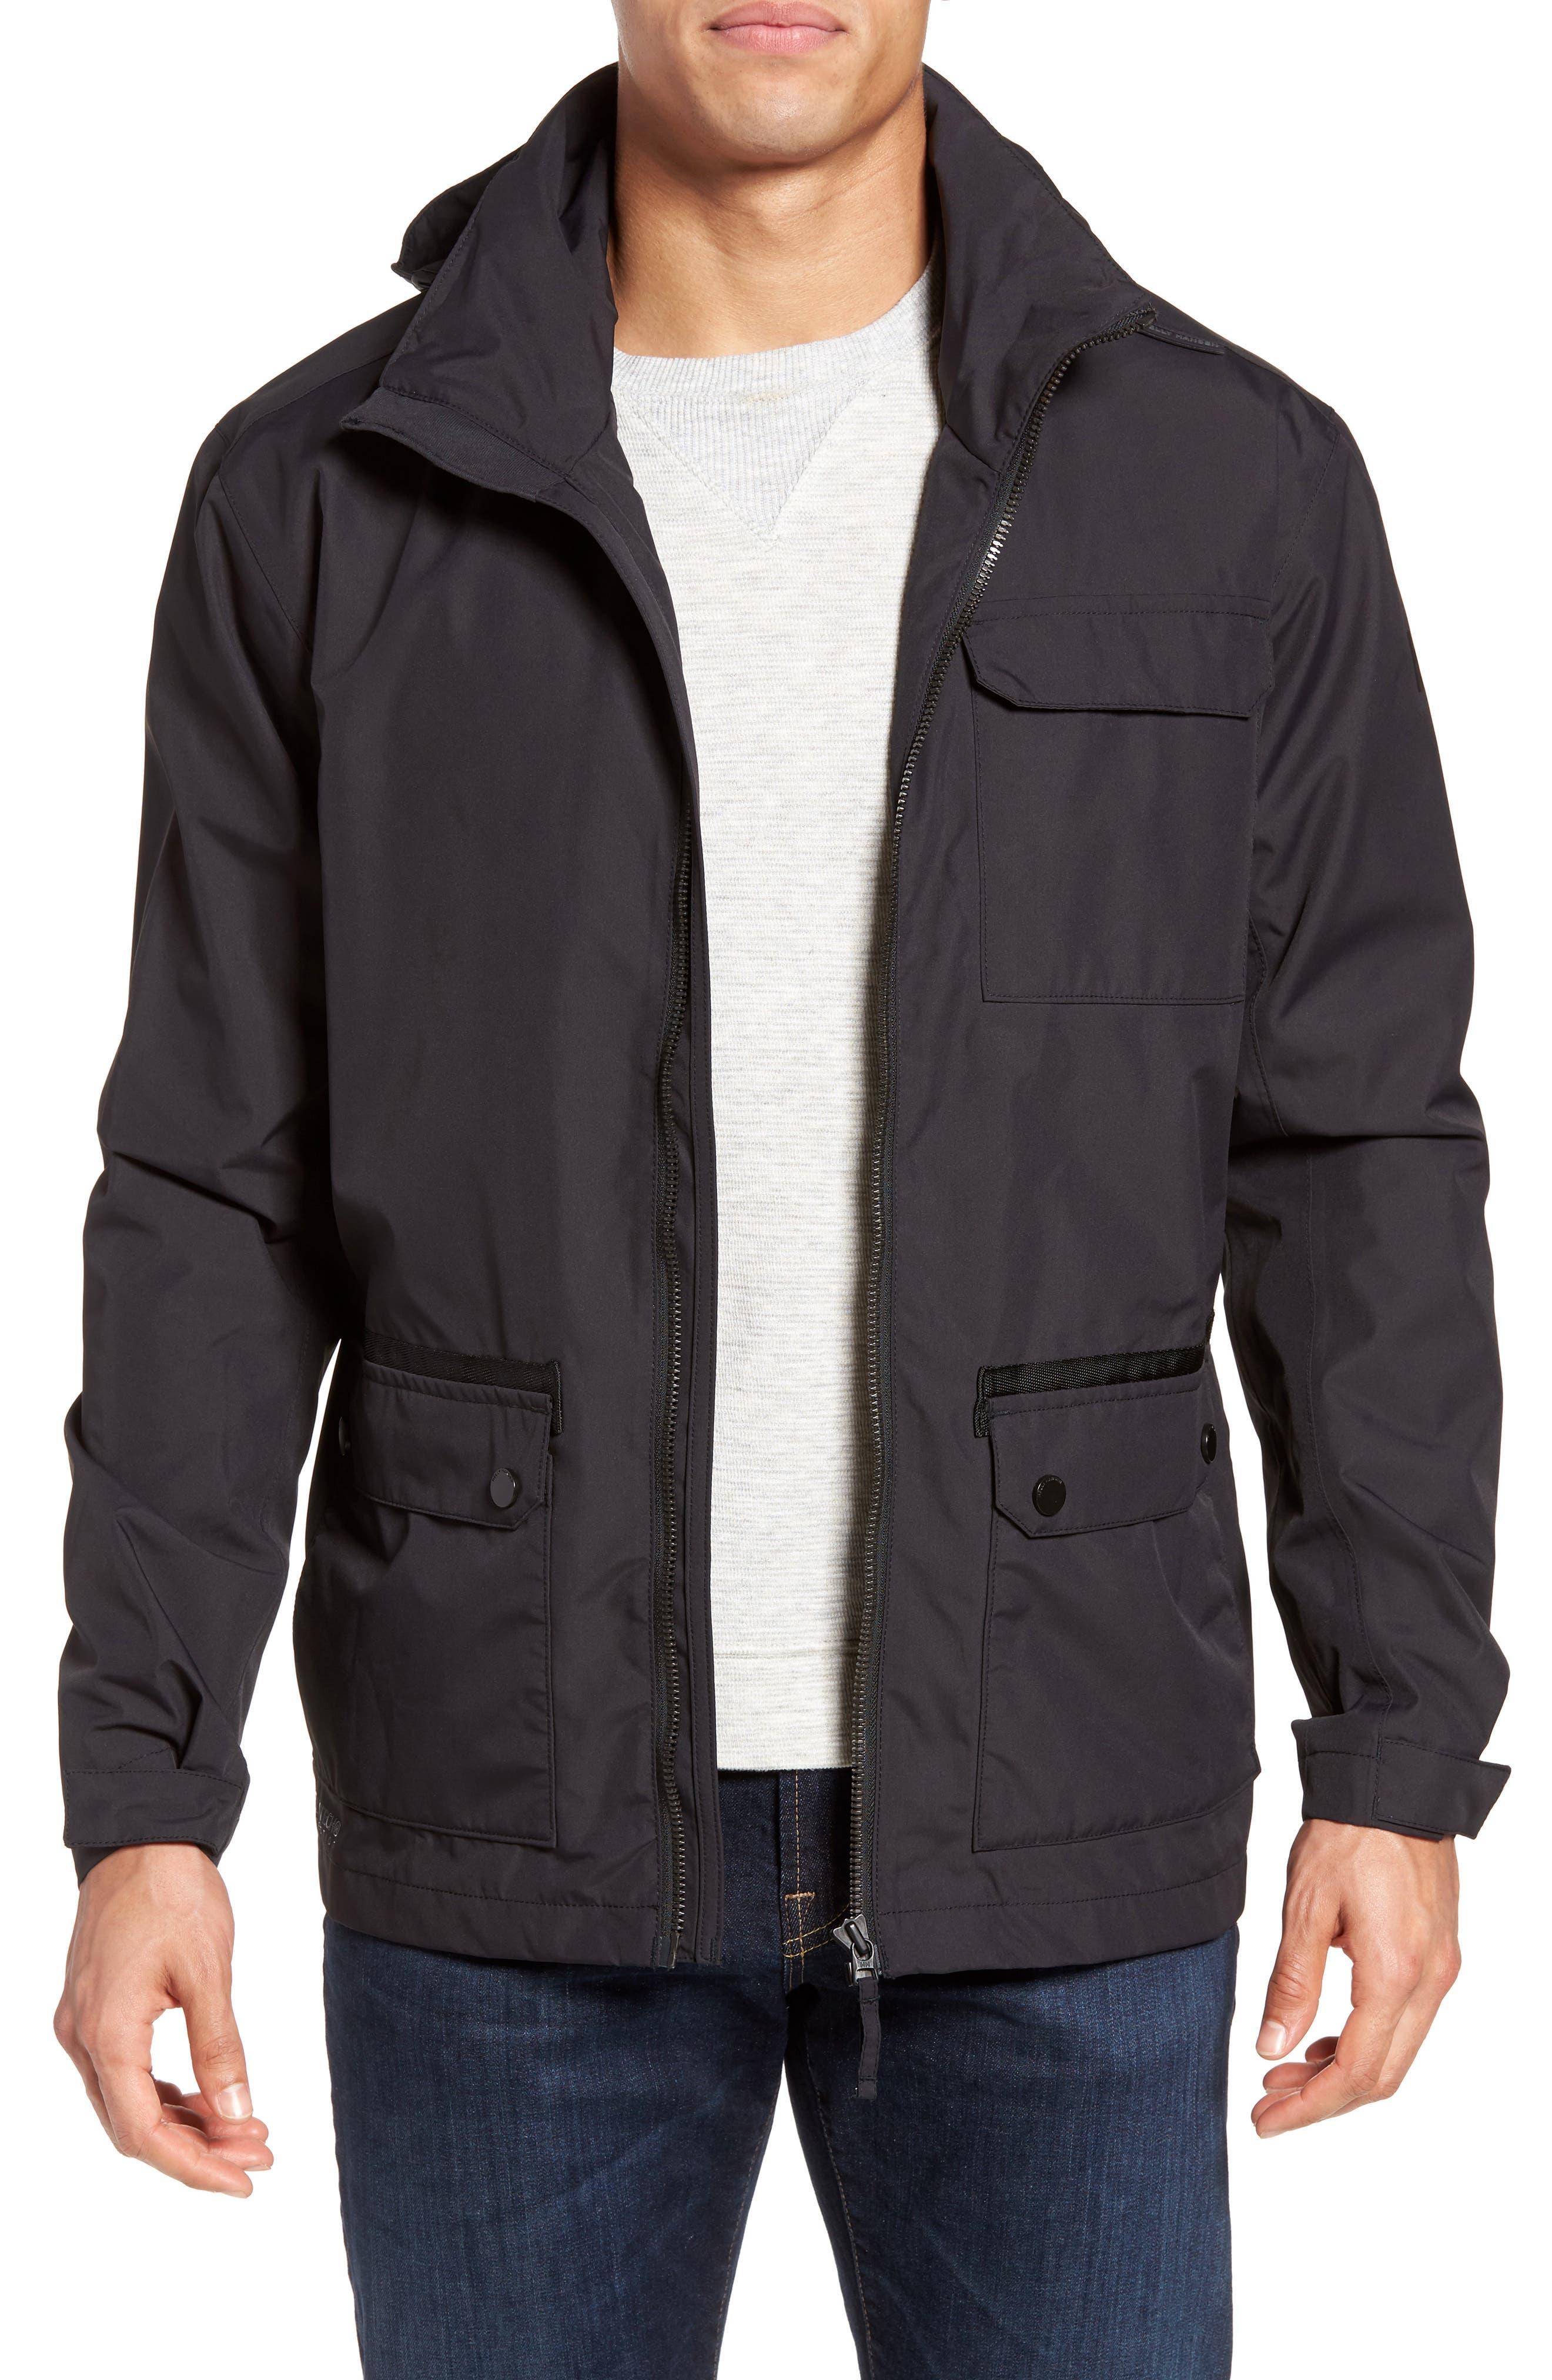 HELLY HANSEN Highlands Rain Jacket, Main, color, 001